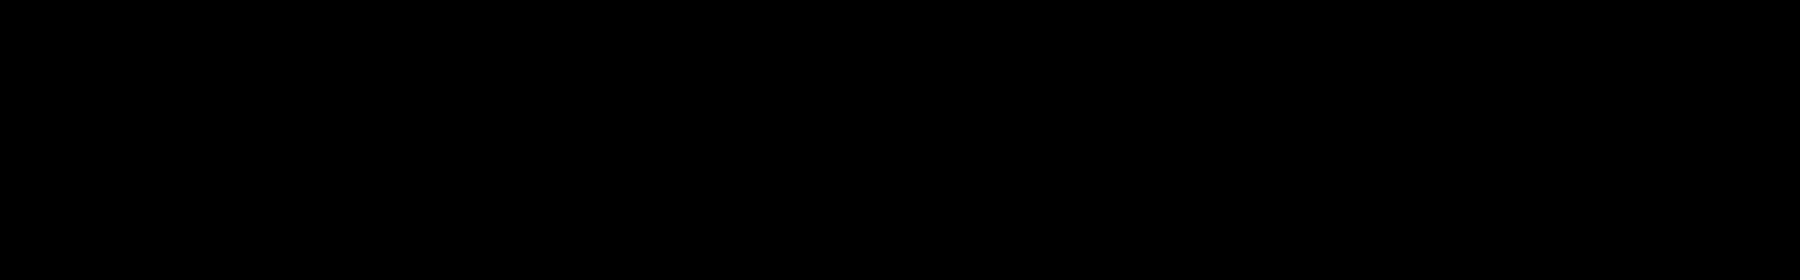 Venom (Ableton Live Template) audio waveform